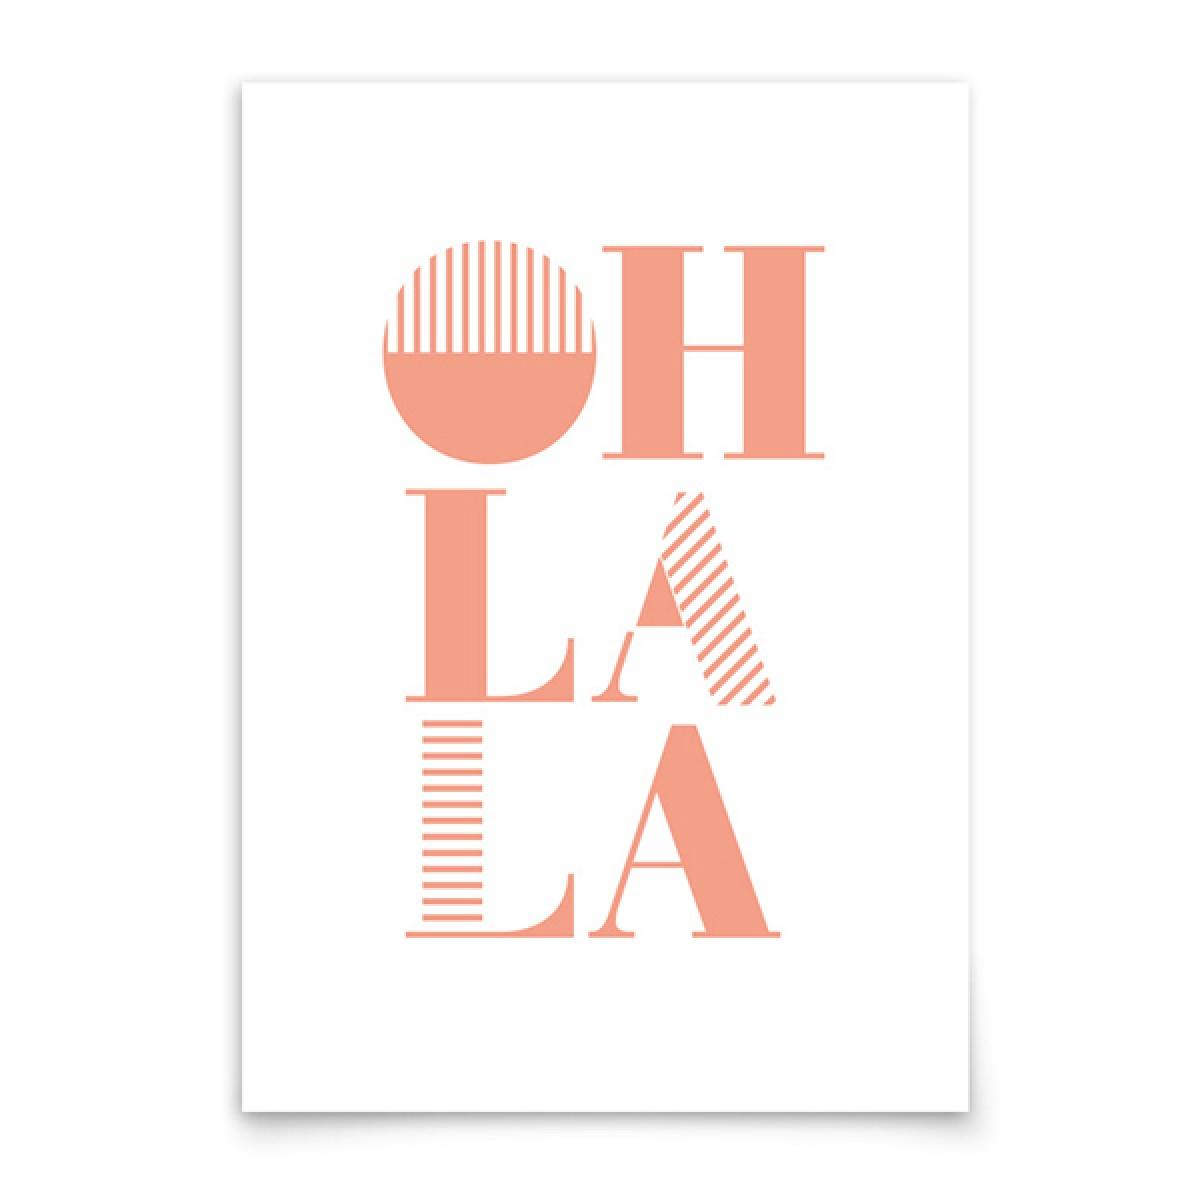 aprilplace // Oh la la // Kunstdruck Din A4